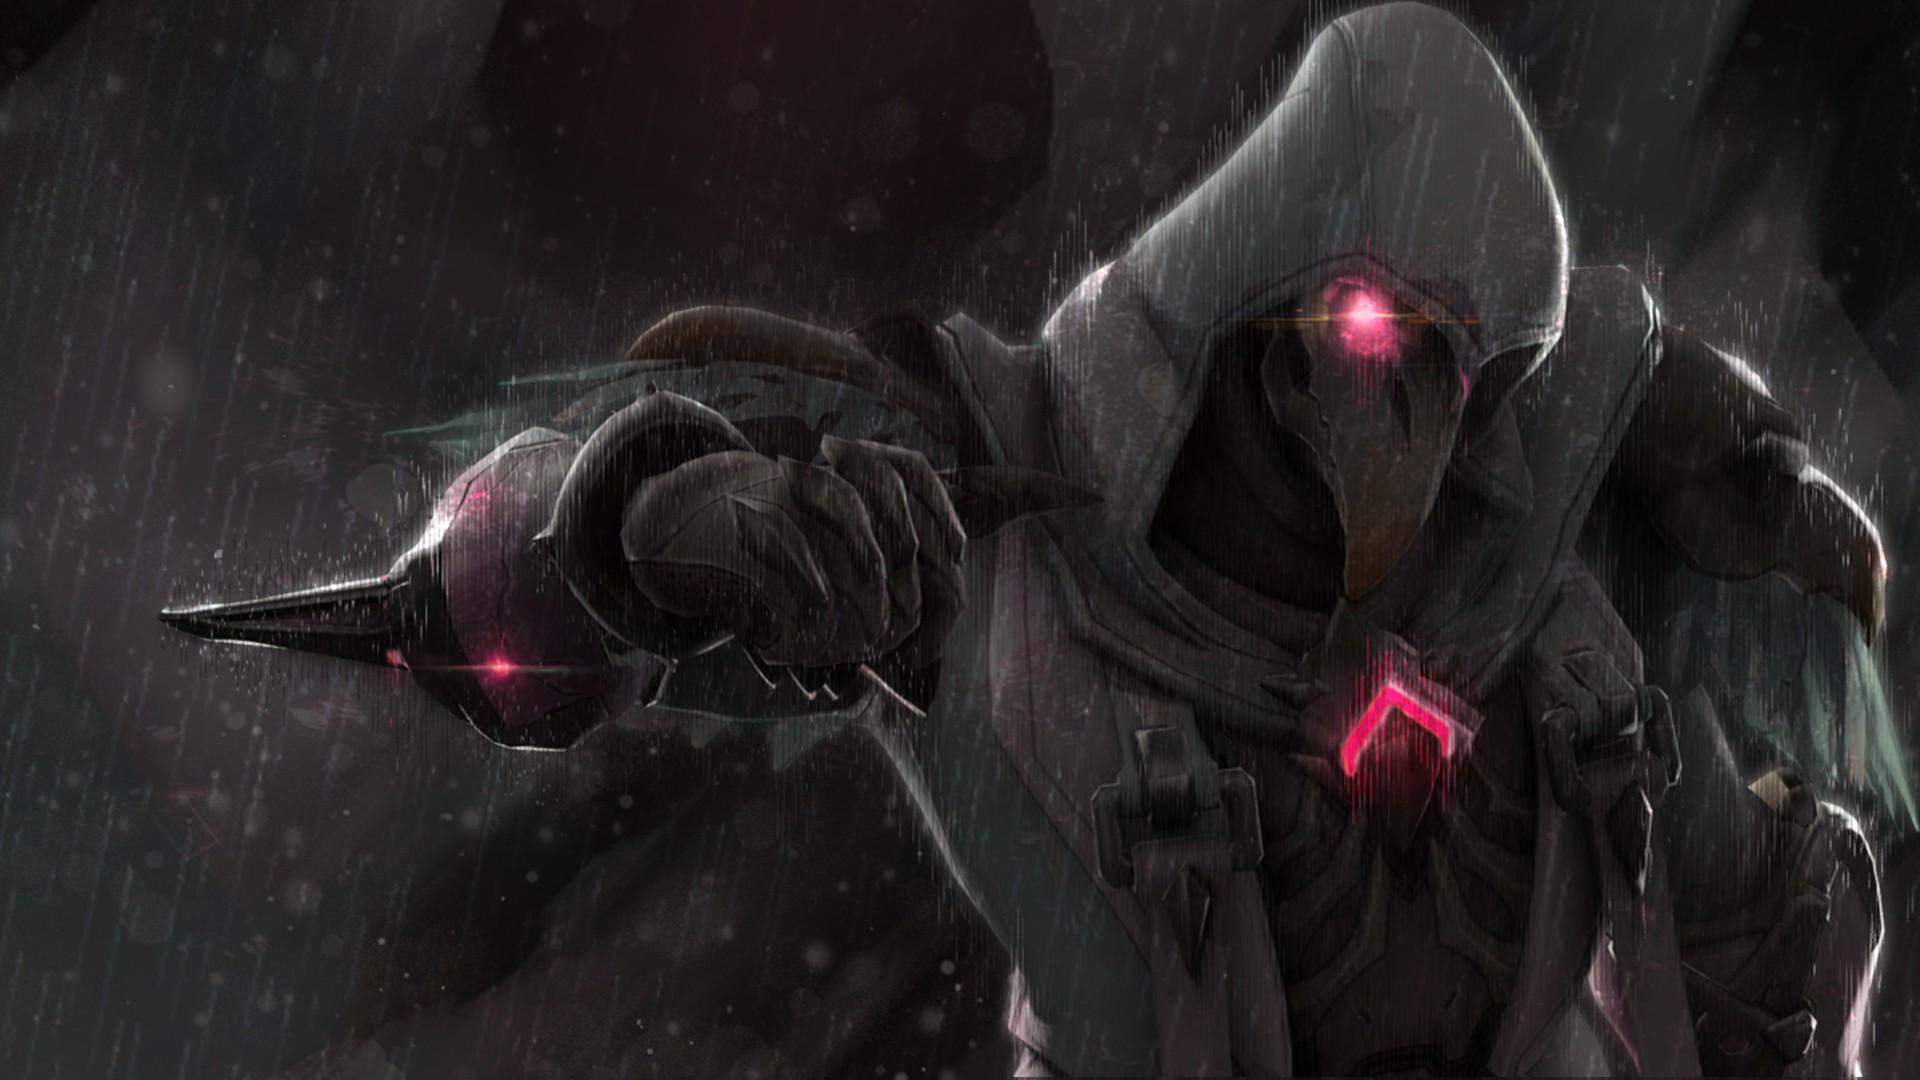 Reaper Overwatch Wallpaper 183 ① Download Free Amazing Full